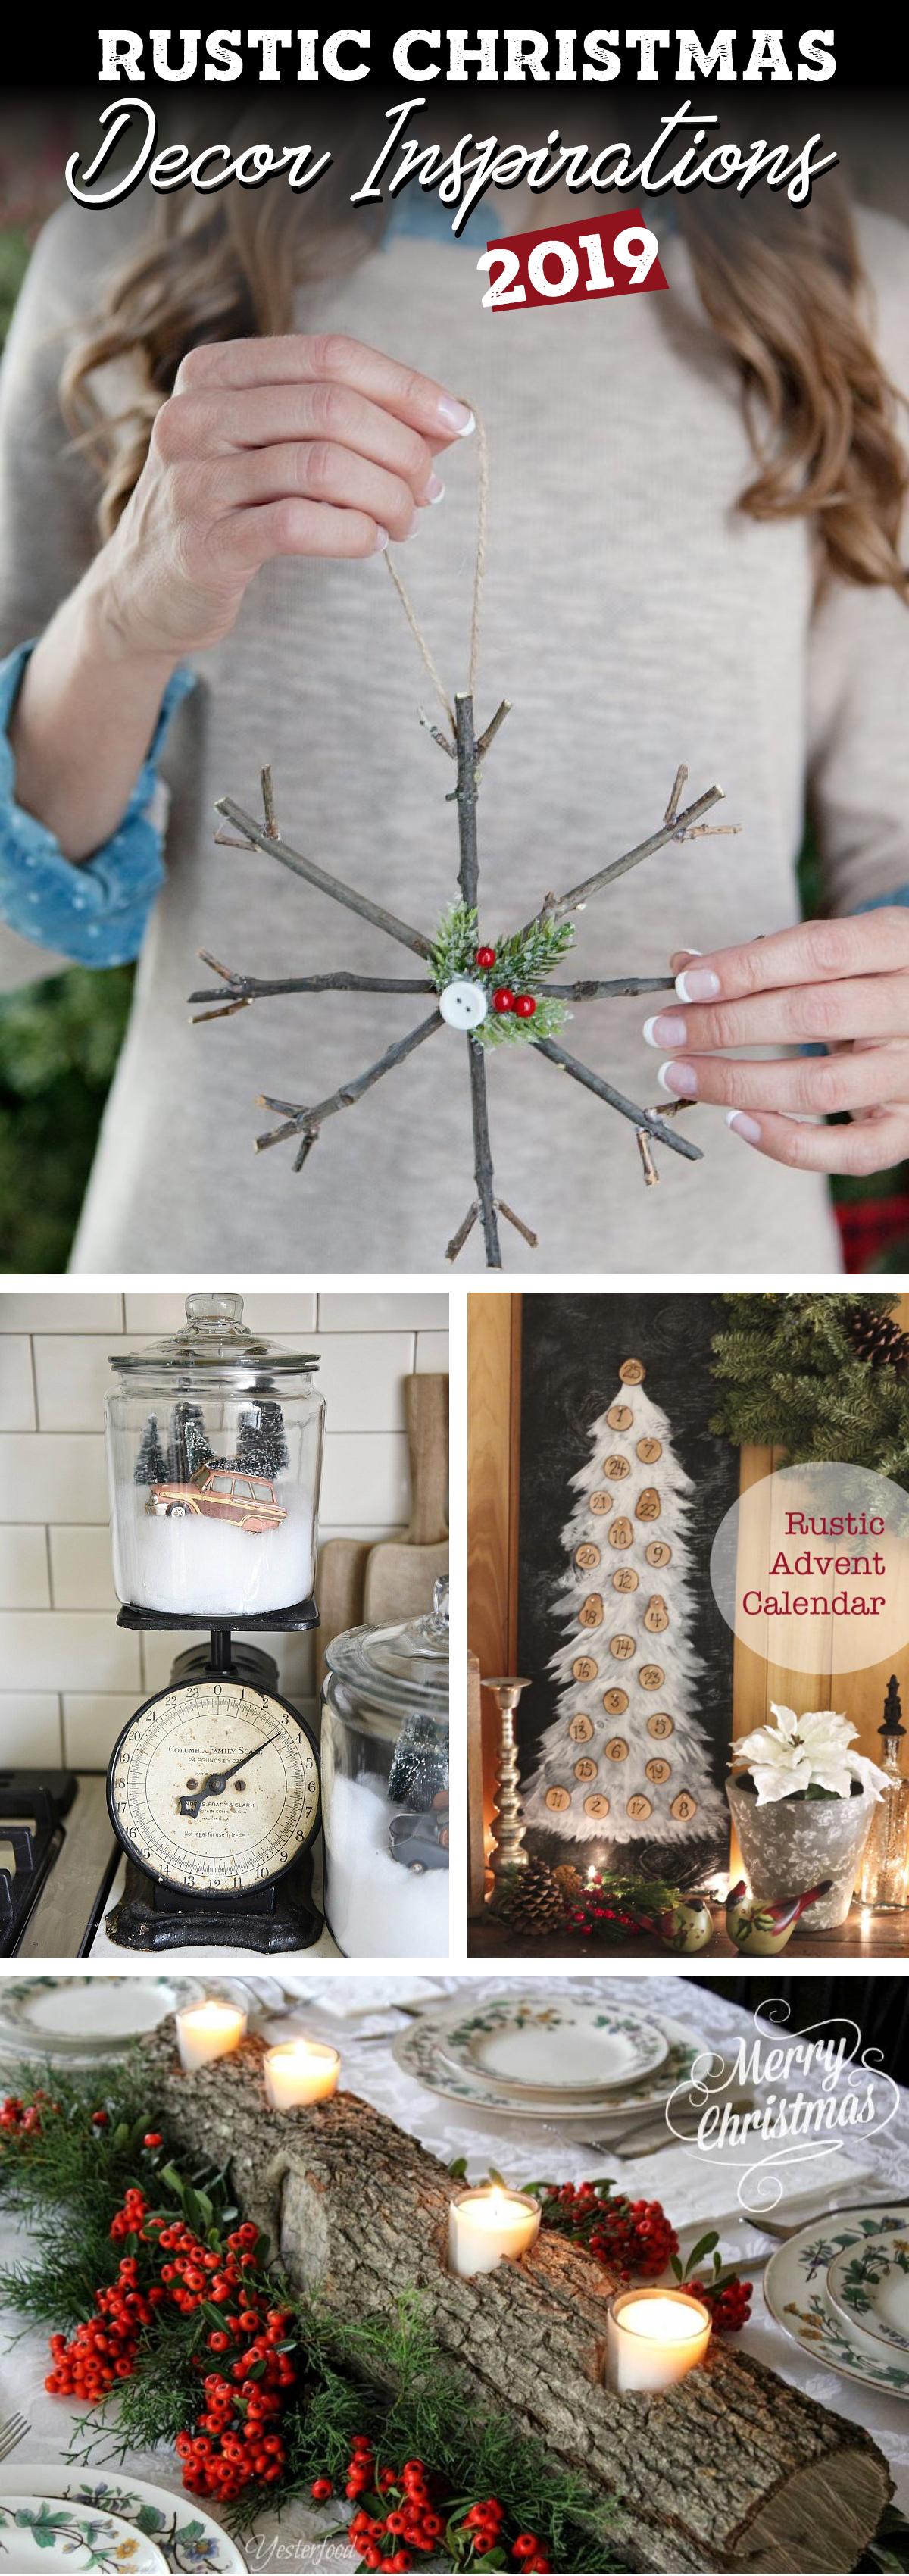 Fabulous Rustic Christmas Decor Inspirations